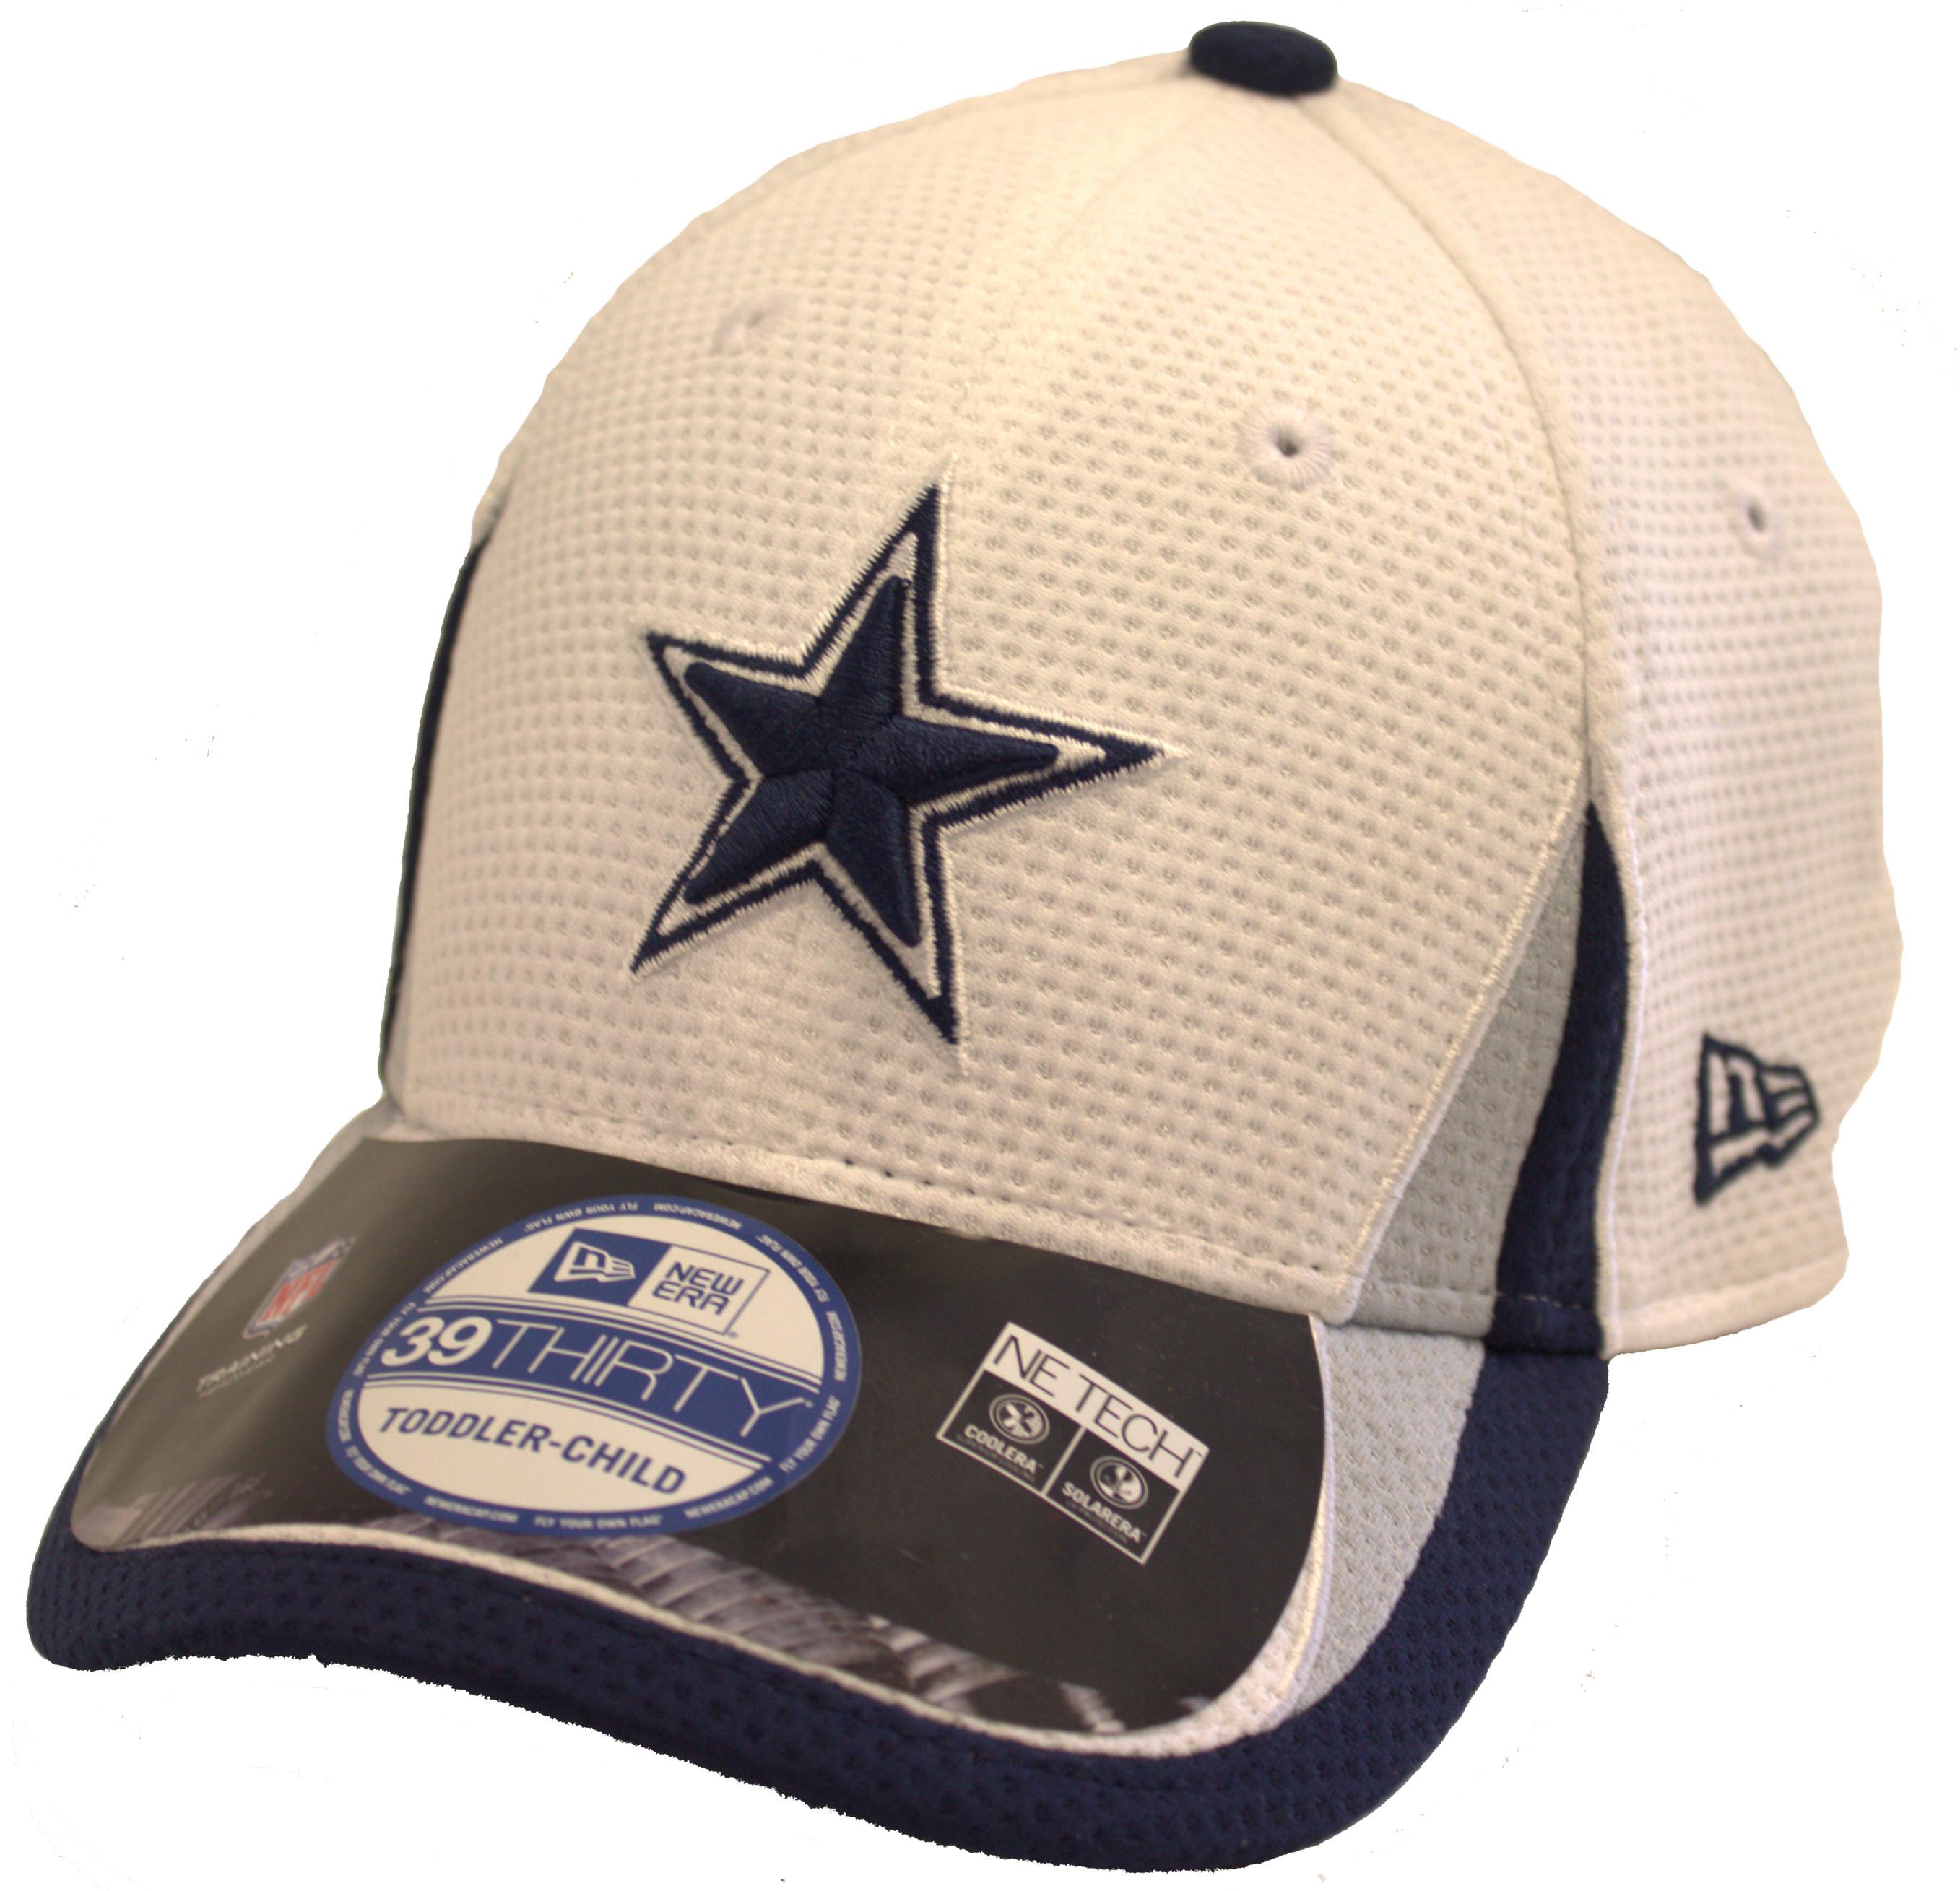 0894a054a4f ... new era 1bdfa 6e92c  store dallas cowboys 39thirty toddler child flex  fit hat d88c5 a9bf9